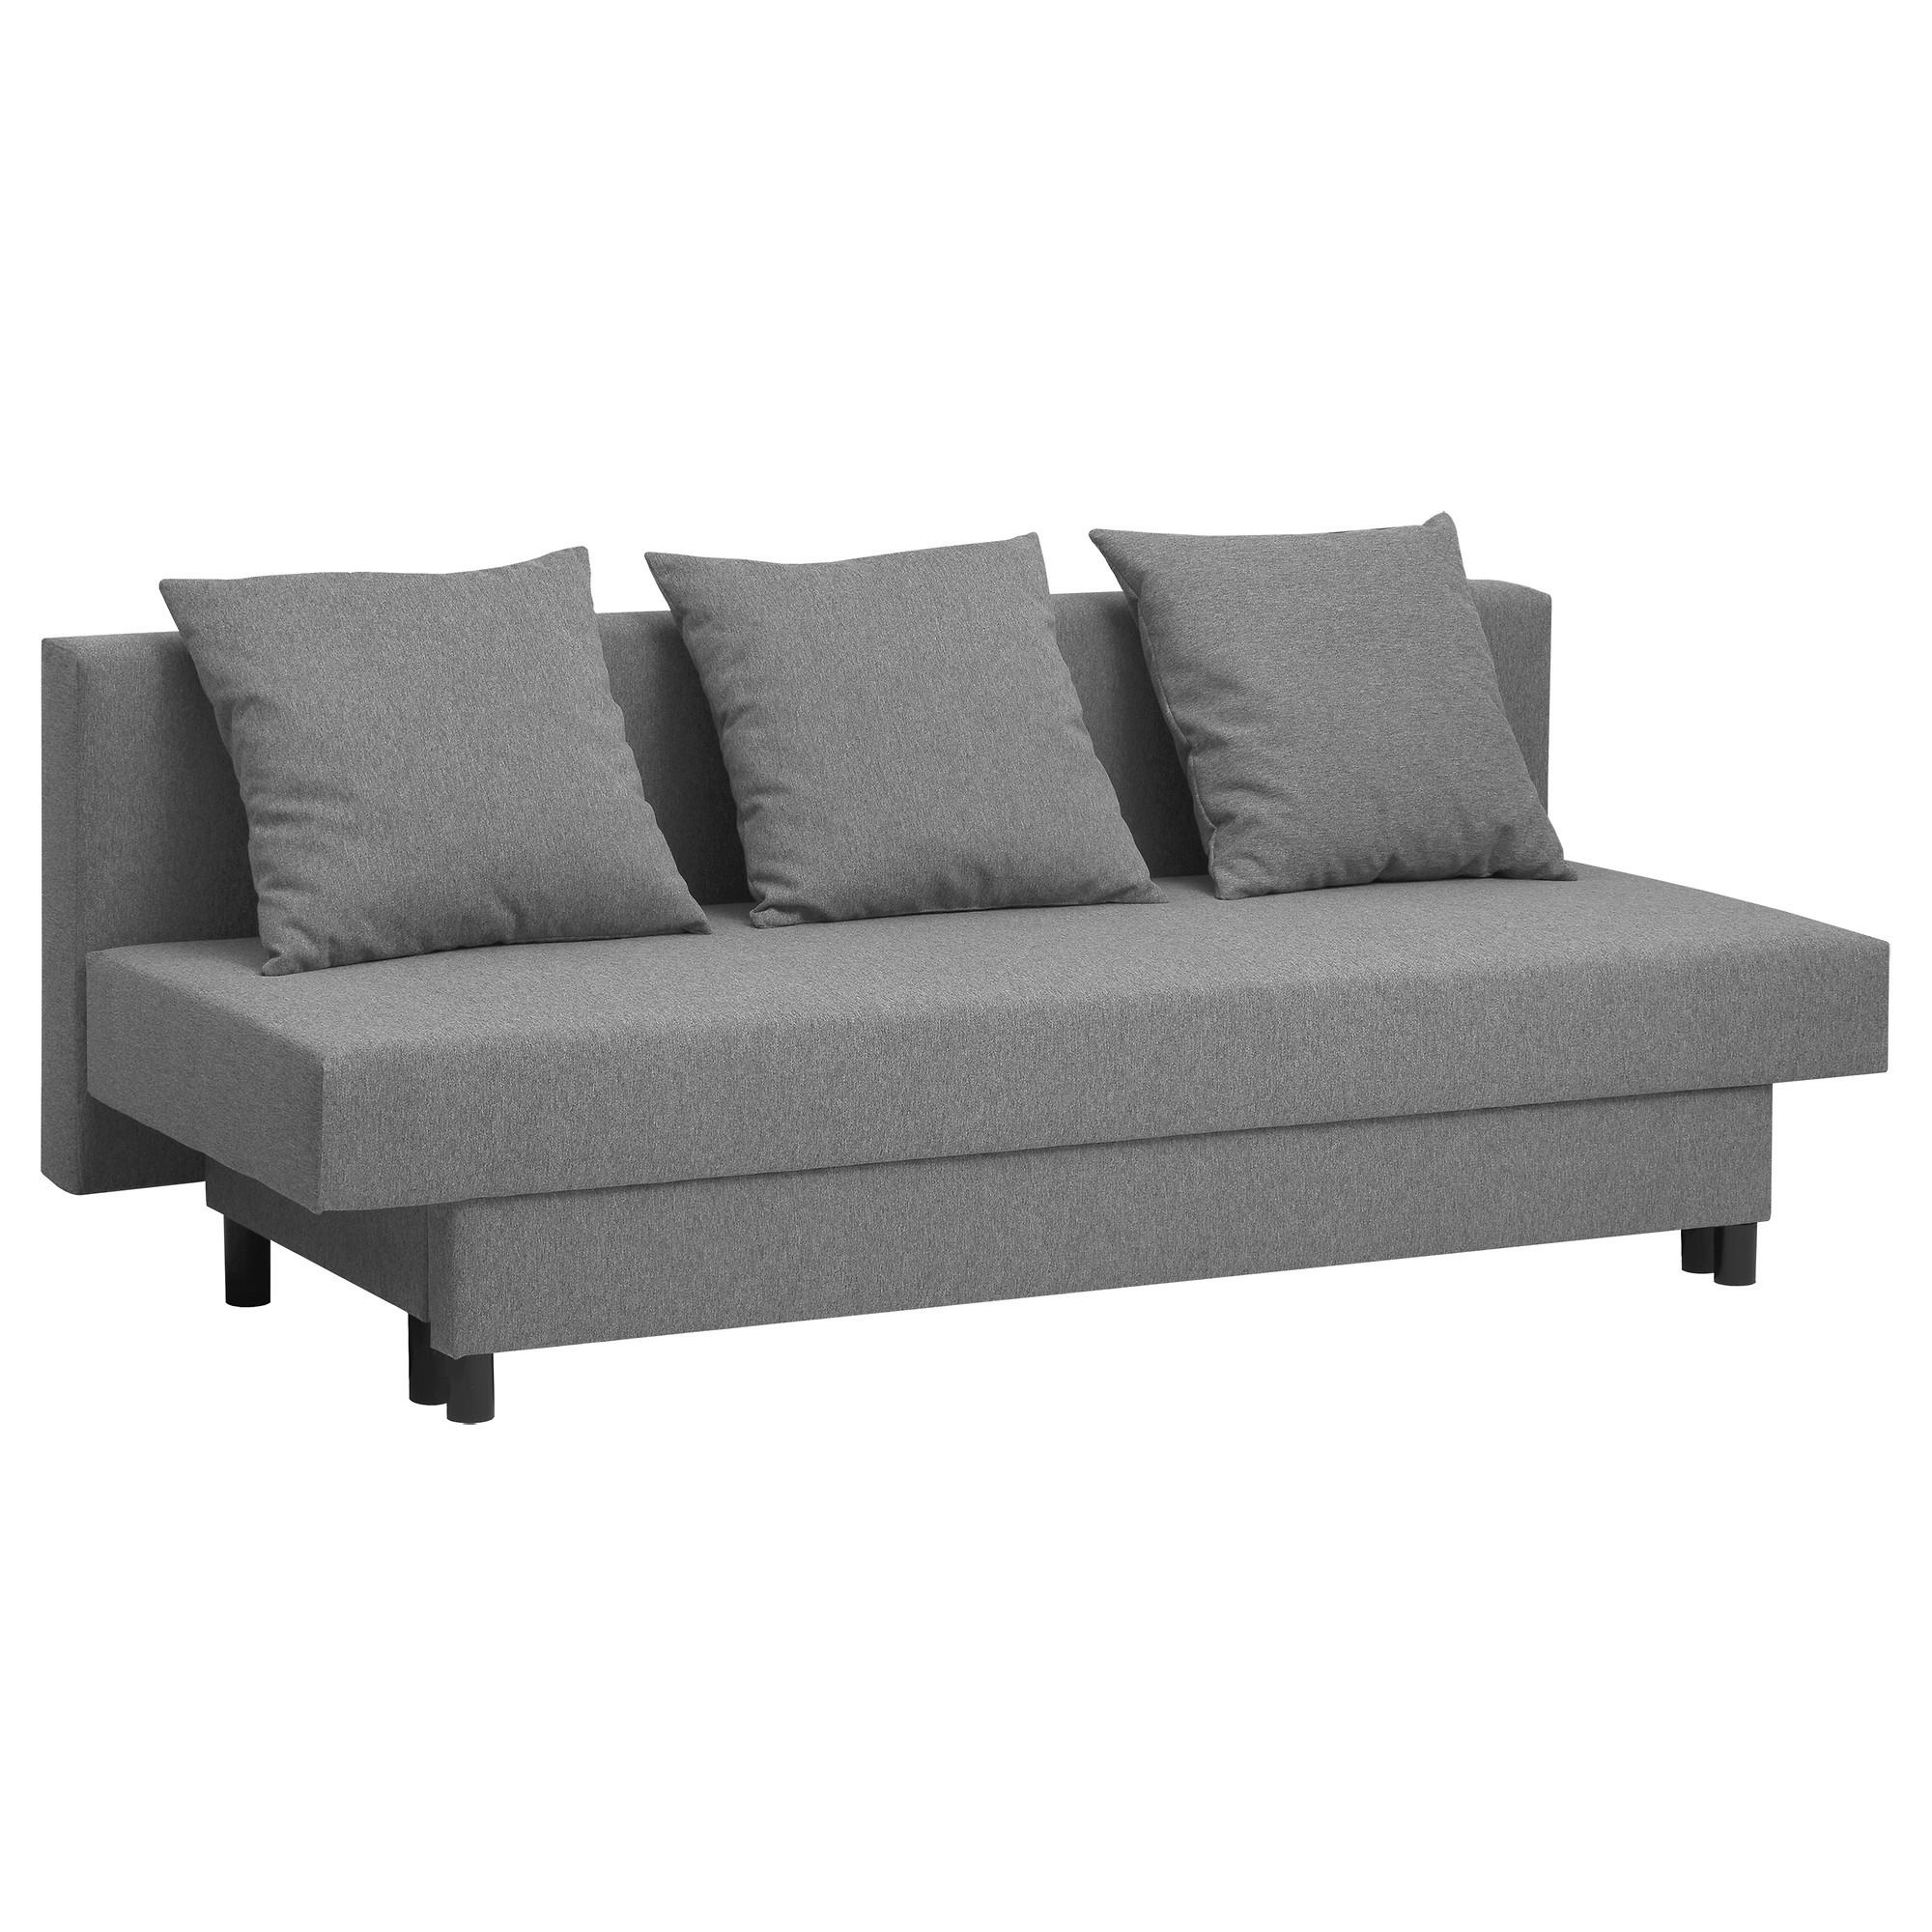 Canapé Bz 160x200 Ikea